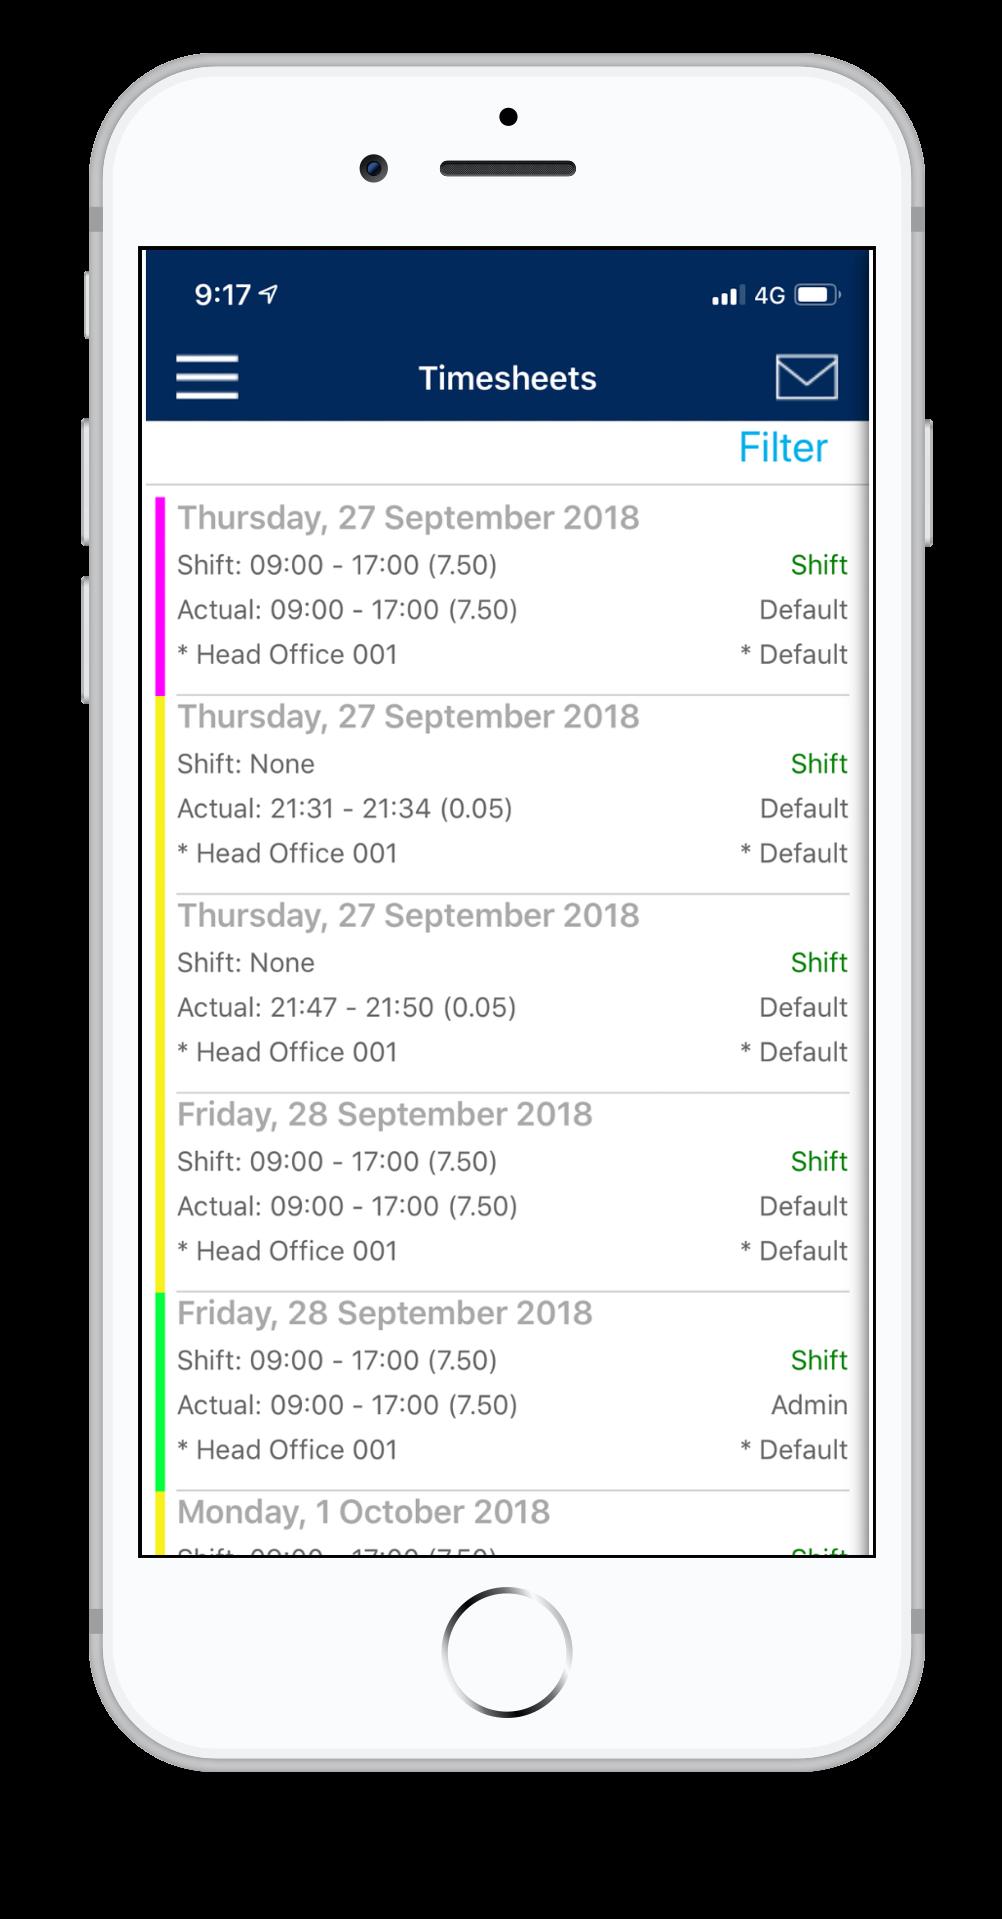 Timesheet App